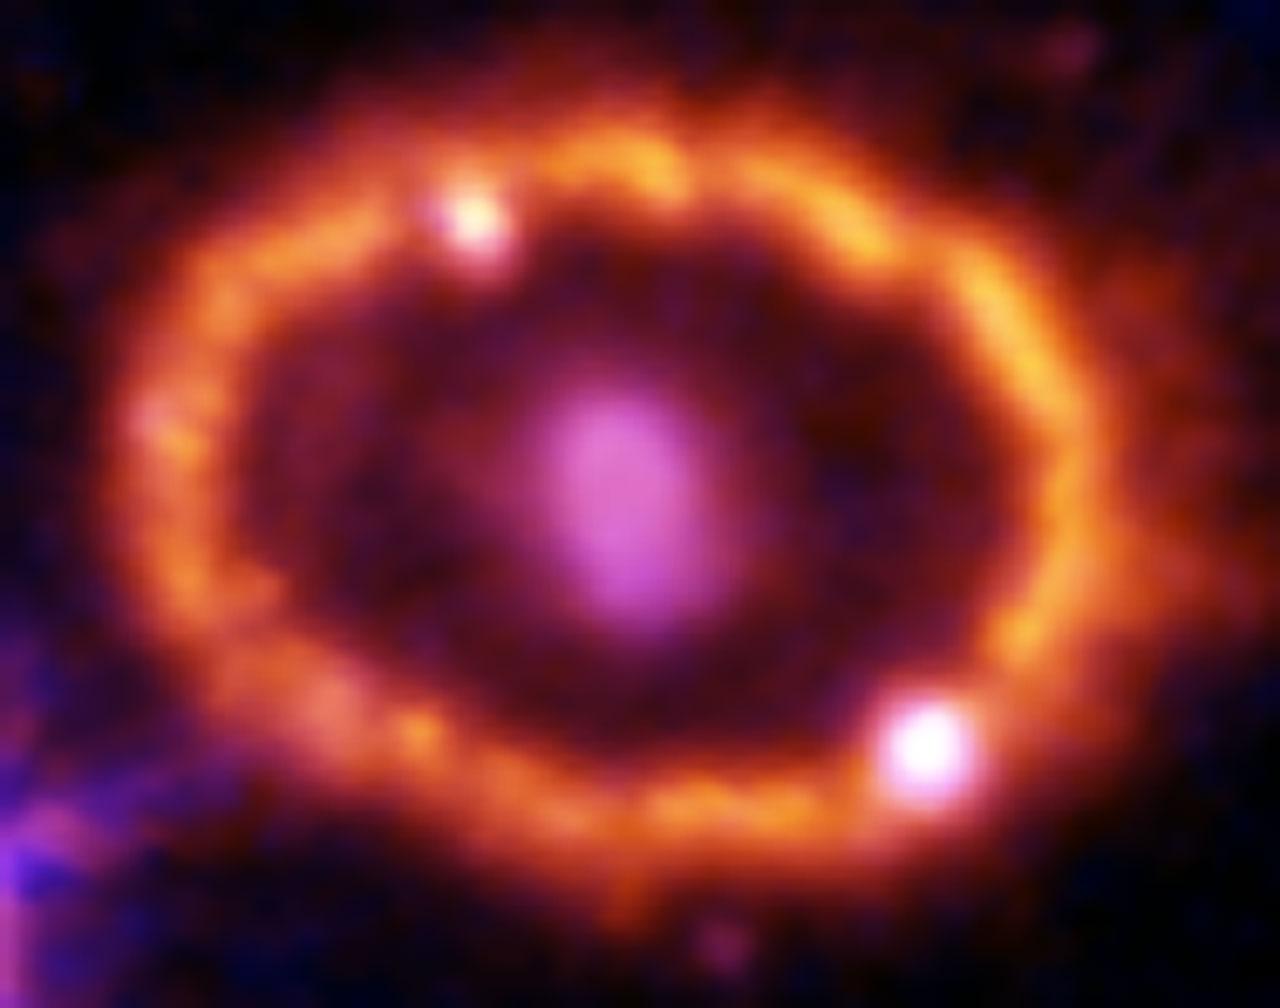 Hubble Supernova 1987A Scrapbook (1994-2003) - Image 6